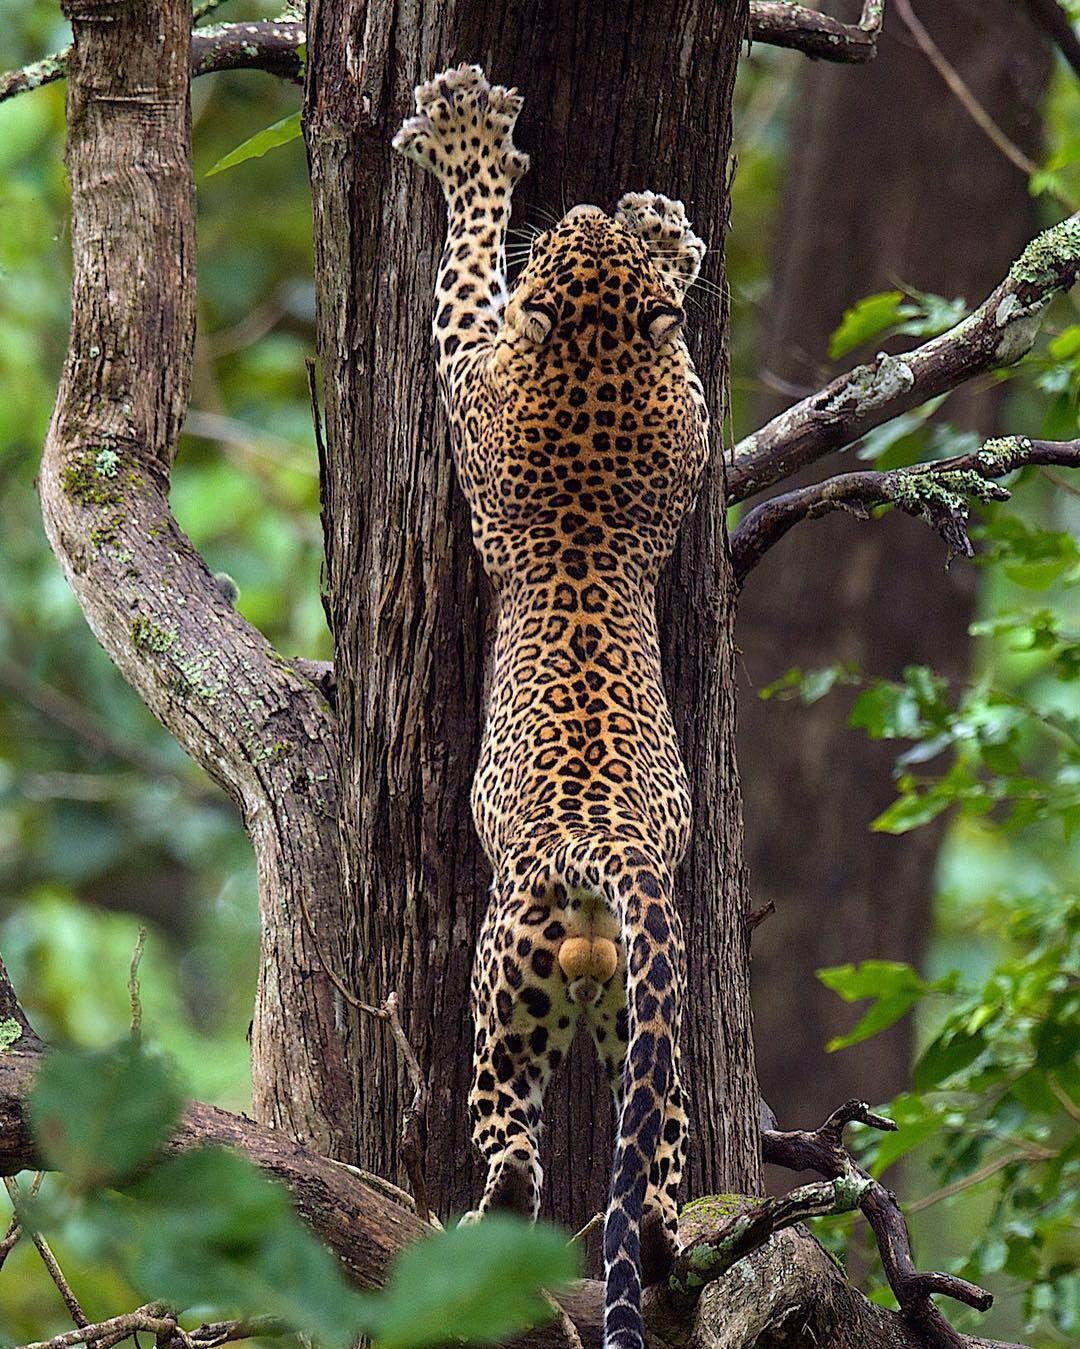 "wildlifeaddicts: ""I want you guys to follow @thomasvijayan  he is an amazing photographer  His account is full of amazing wildlife and animal content!  Make sure you follow @thomasvijayan right now!  #wildlife #travel #animal #cute #love #wildlifephotography #wildlifeaddicts"""